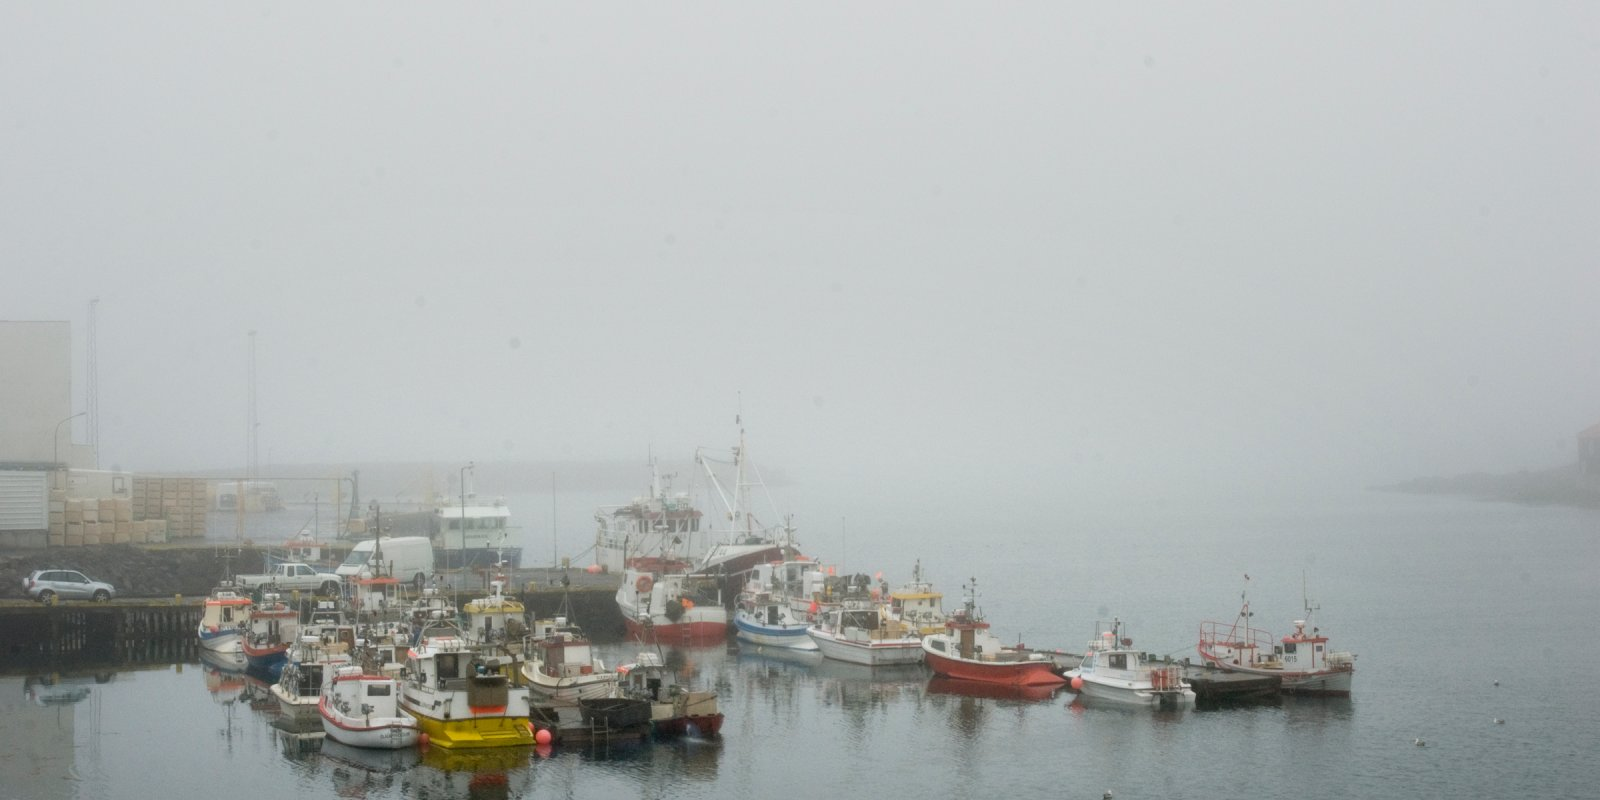 Djúpivogur, A Foggy Heaven